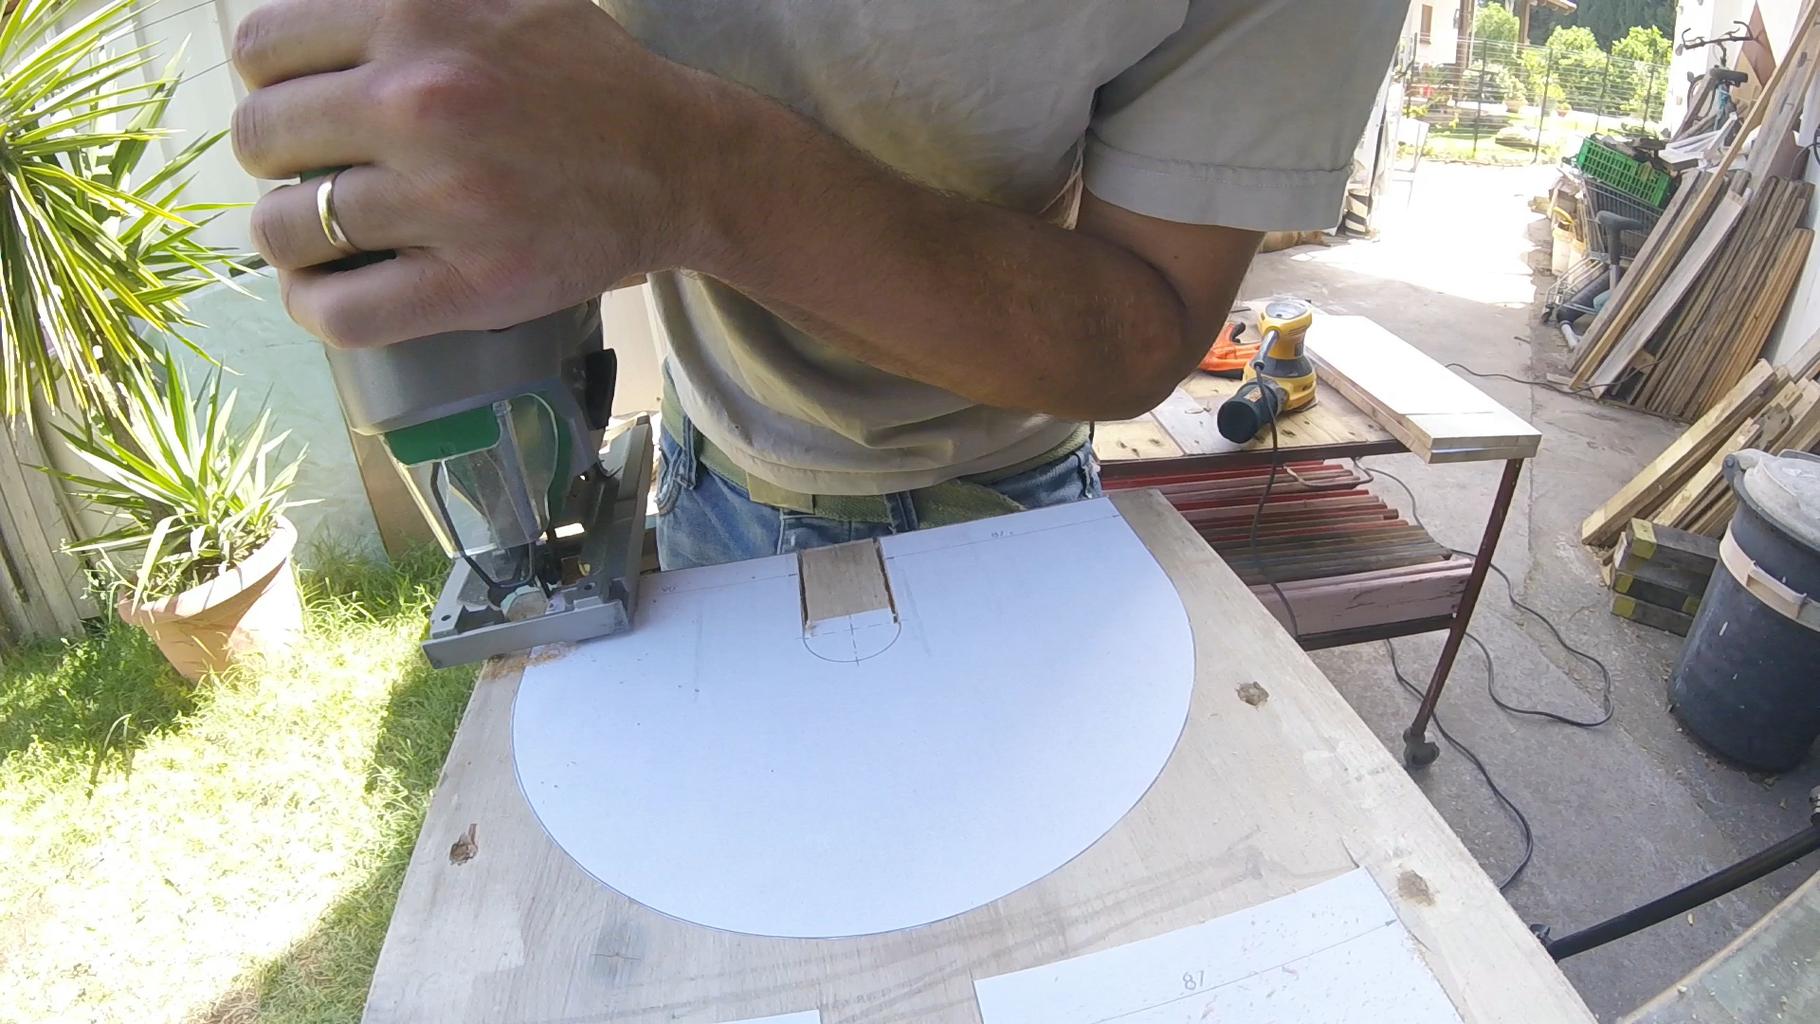 Cutting, Drilling & Sanding